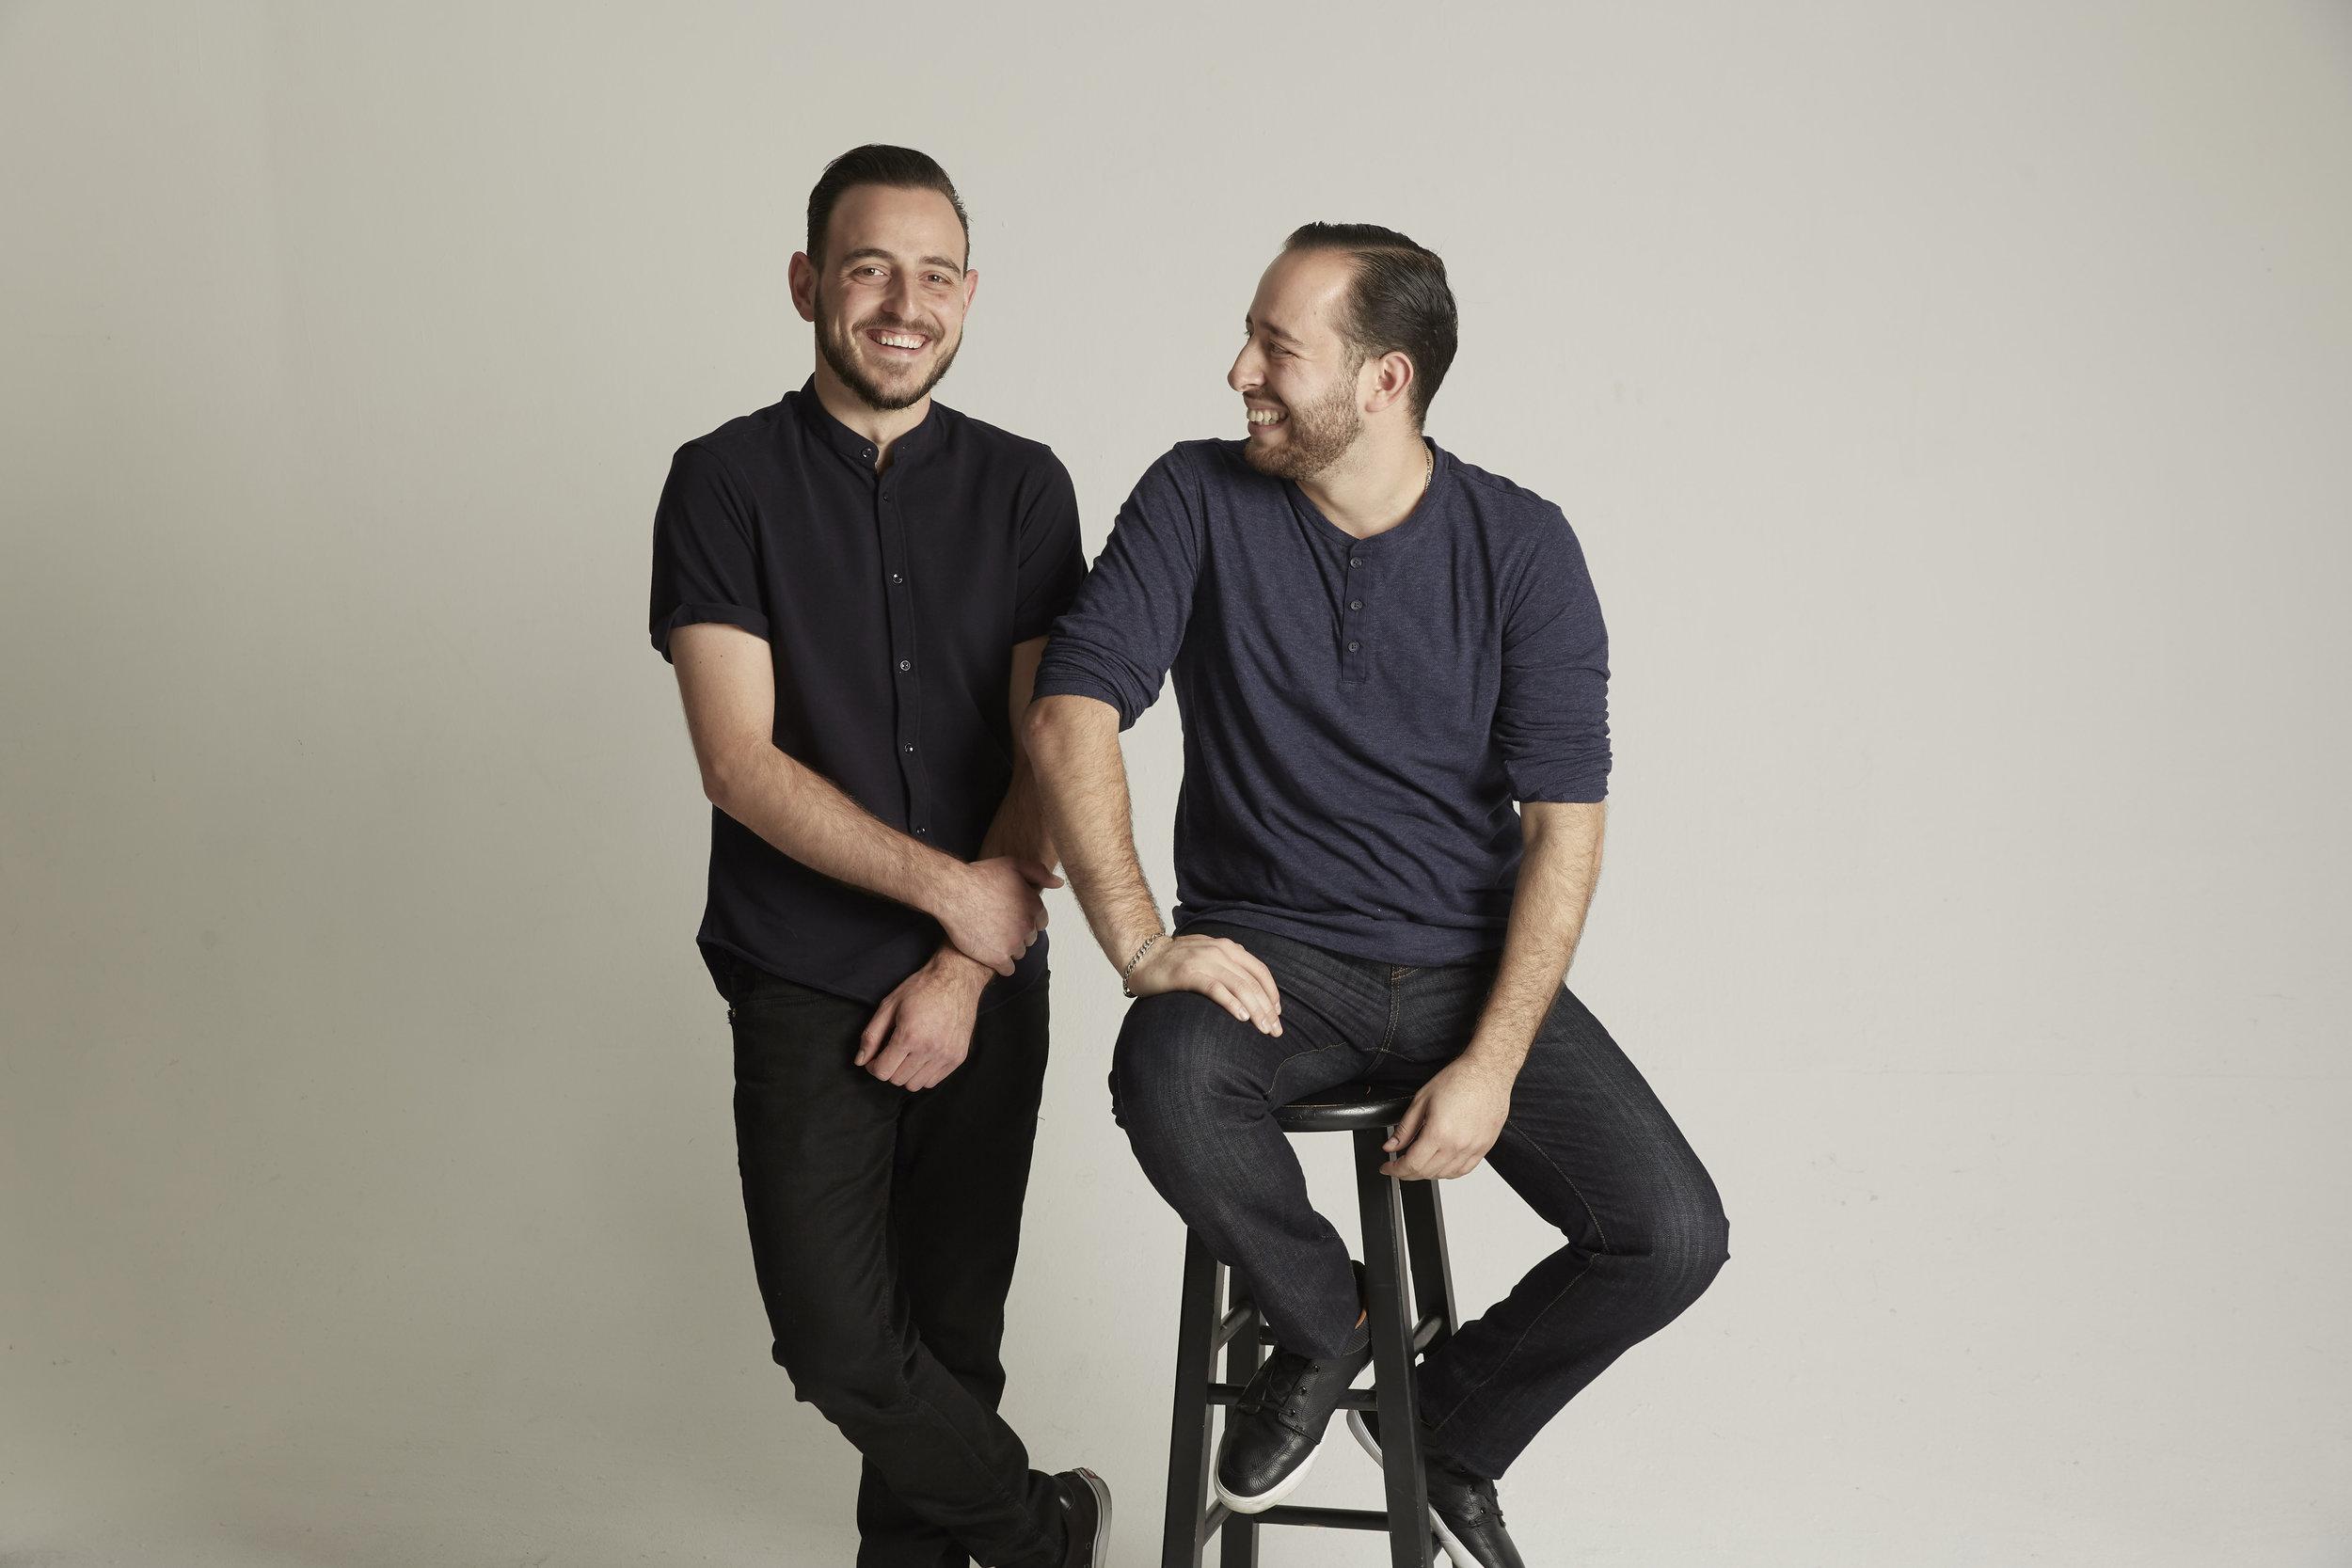 Tropikal Everything Hemp founders, Greg and Gary Avetisyan.